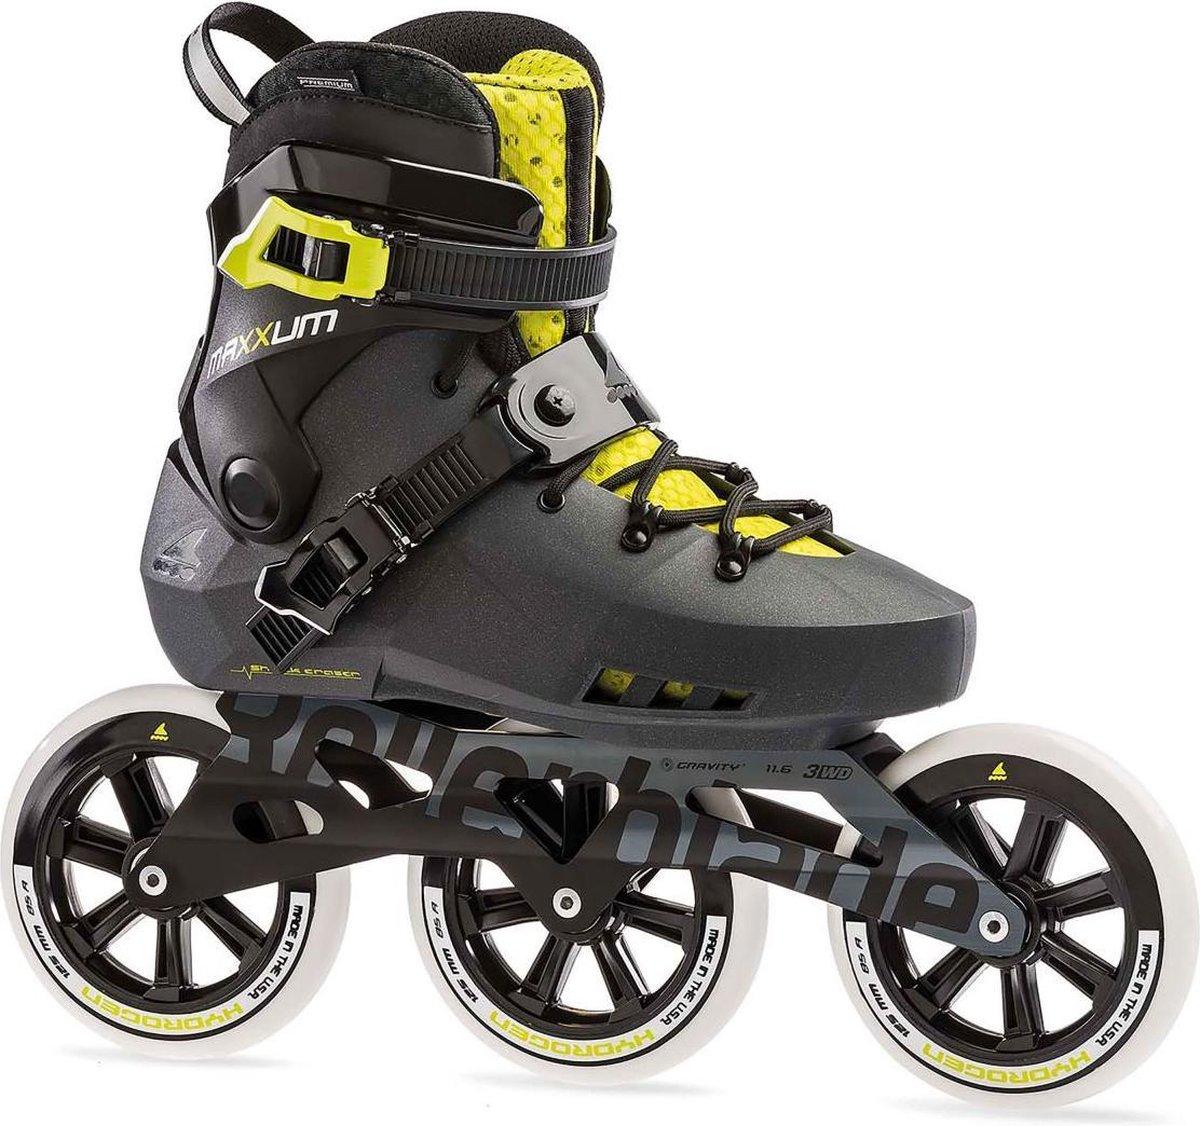 Rollerblade Maxxum Edge inline skates 125 mm metallic grey / lime